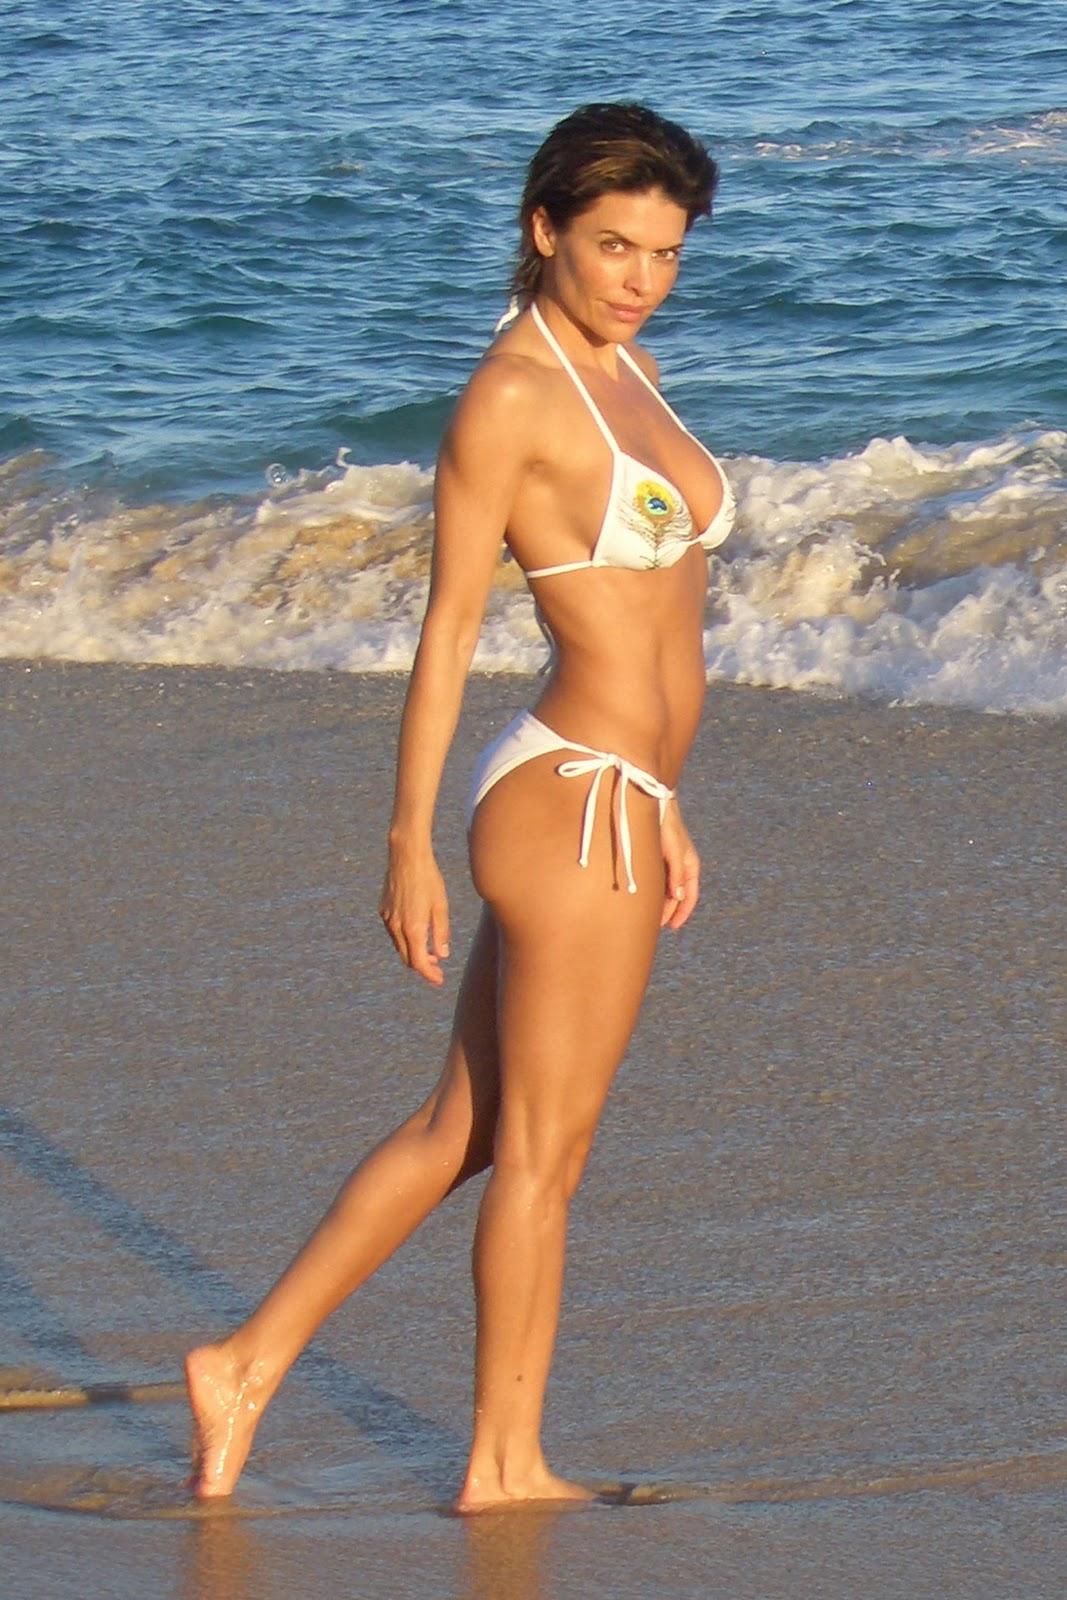 Hollywood actress Lisa Rinna in hot bikini photos - The Hollywood ...